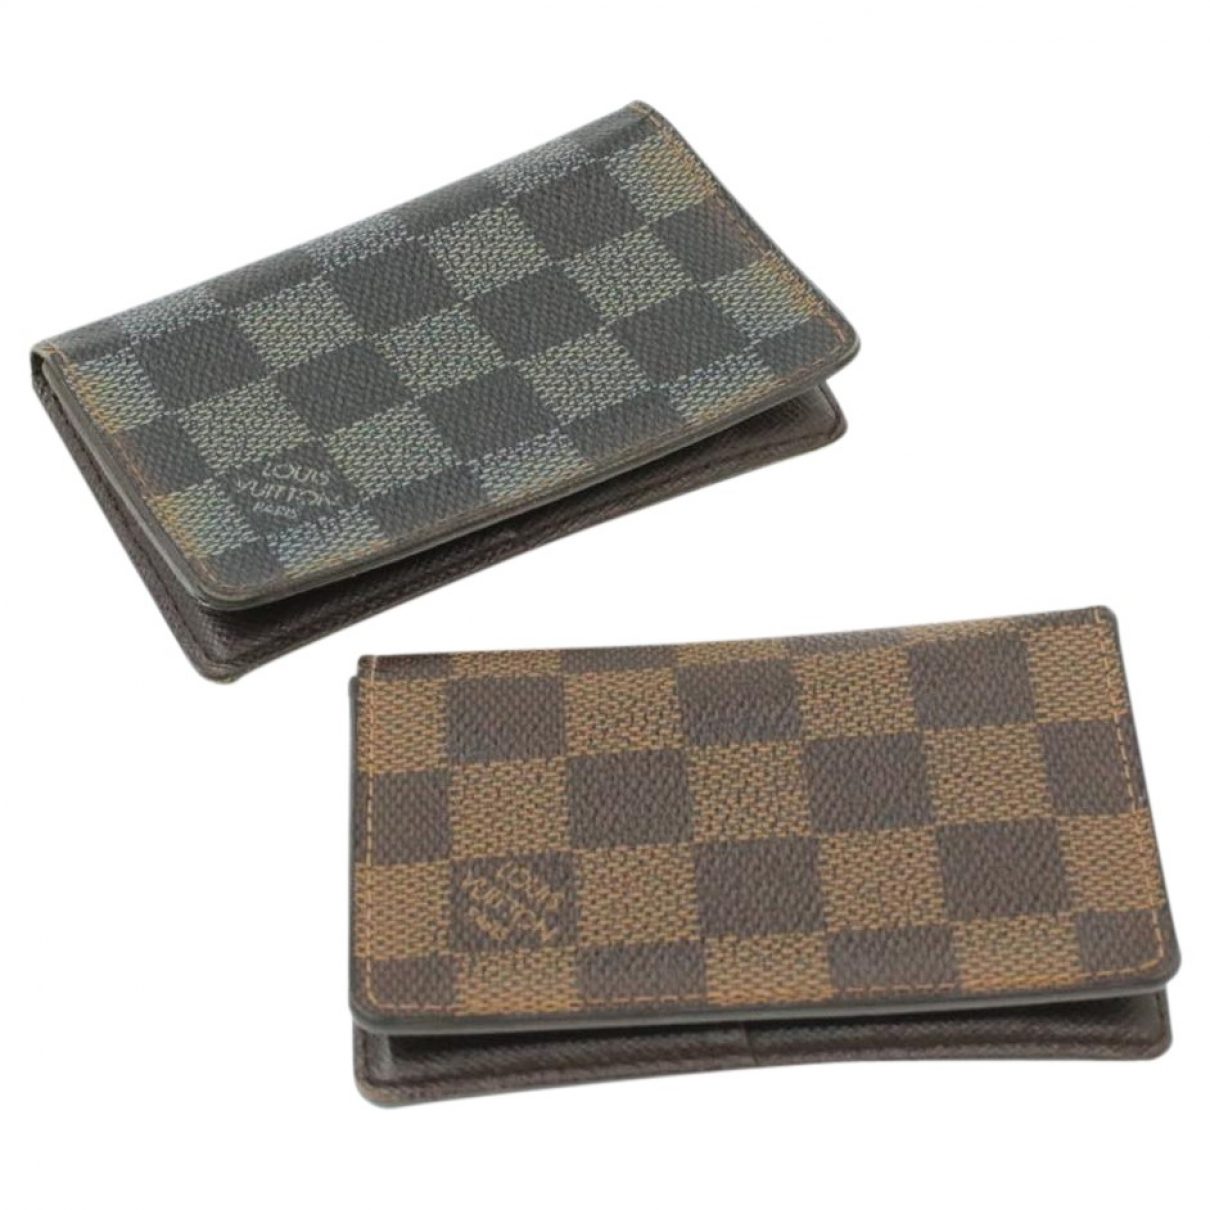 Louis Vuitton \N Schal in  Braun Synthetik